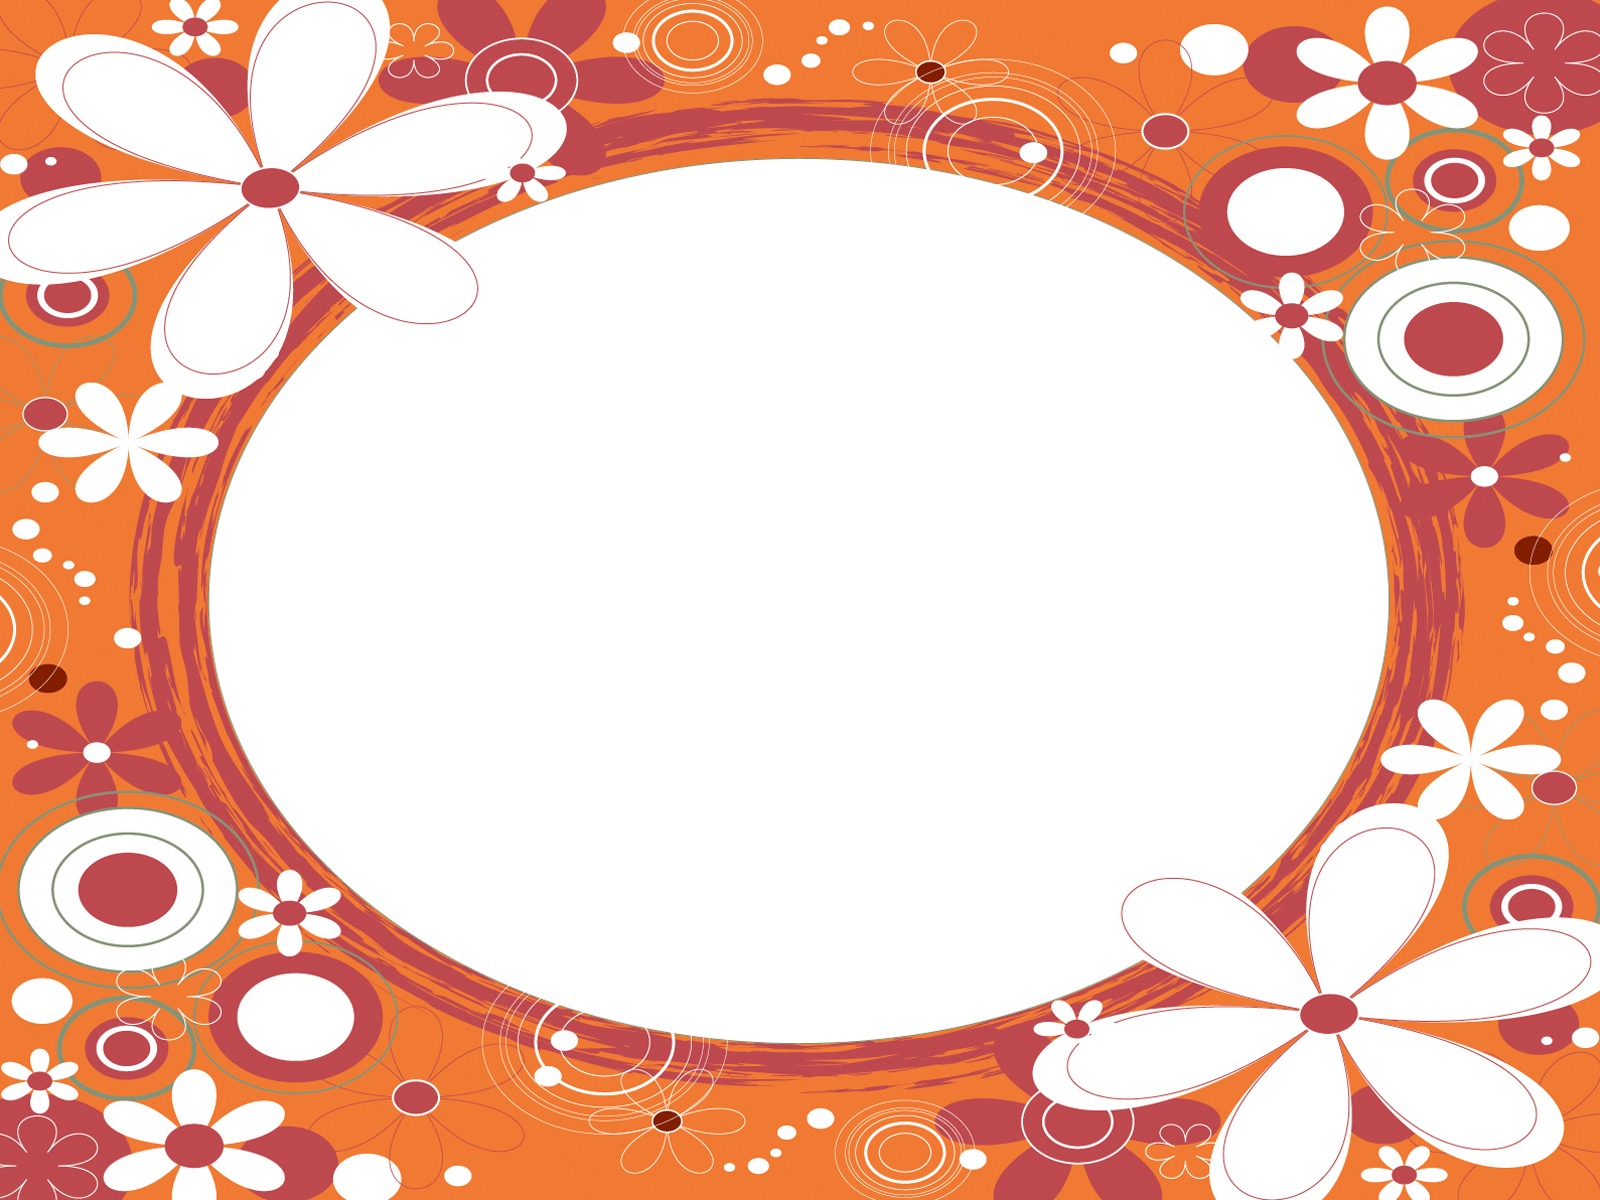 Orange flower frames Backgrounds | Border & Frames, Flowers ...